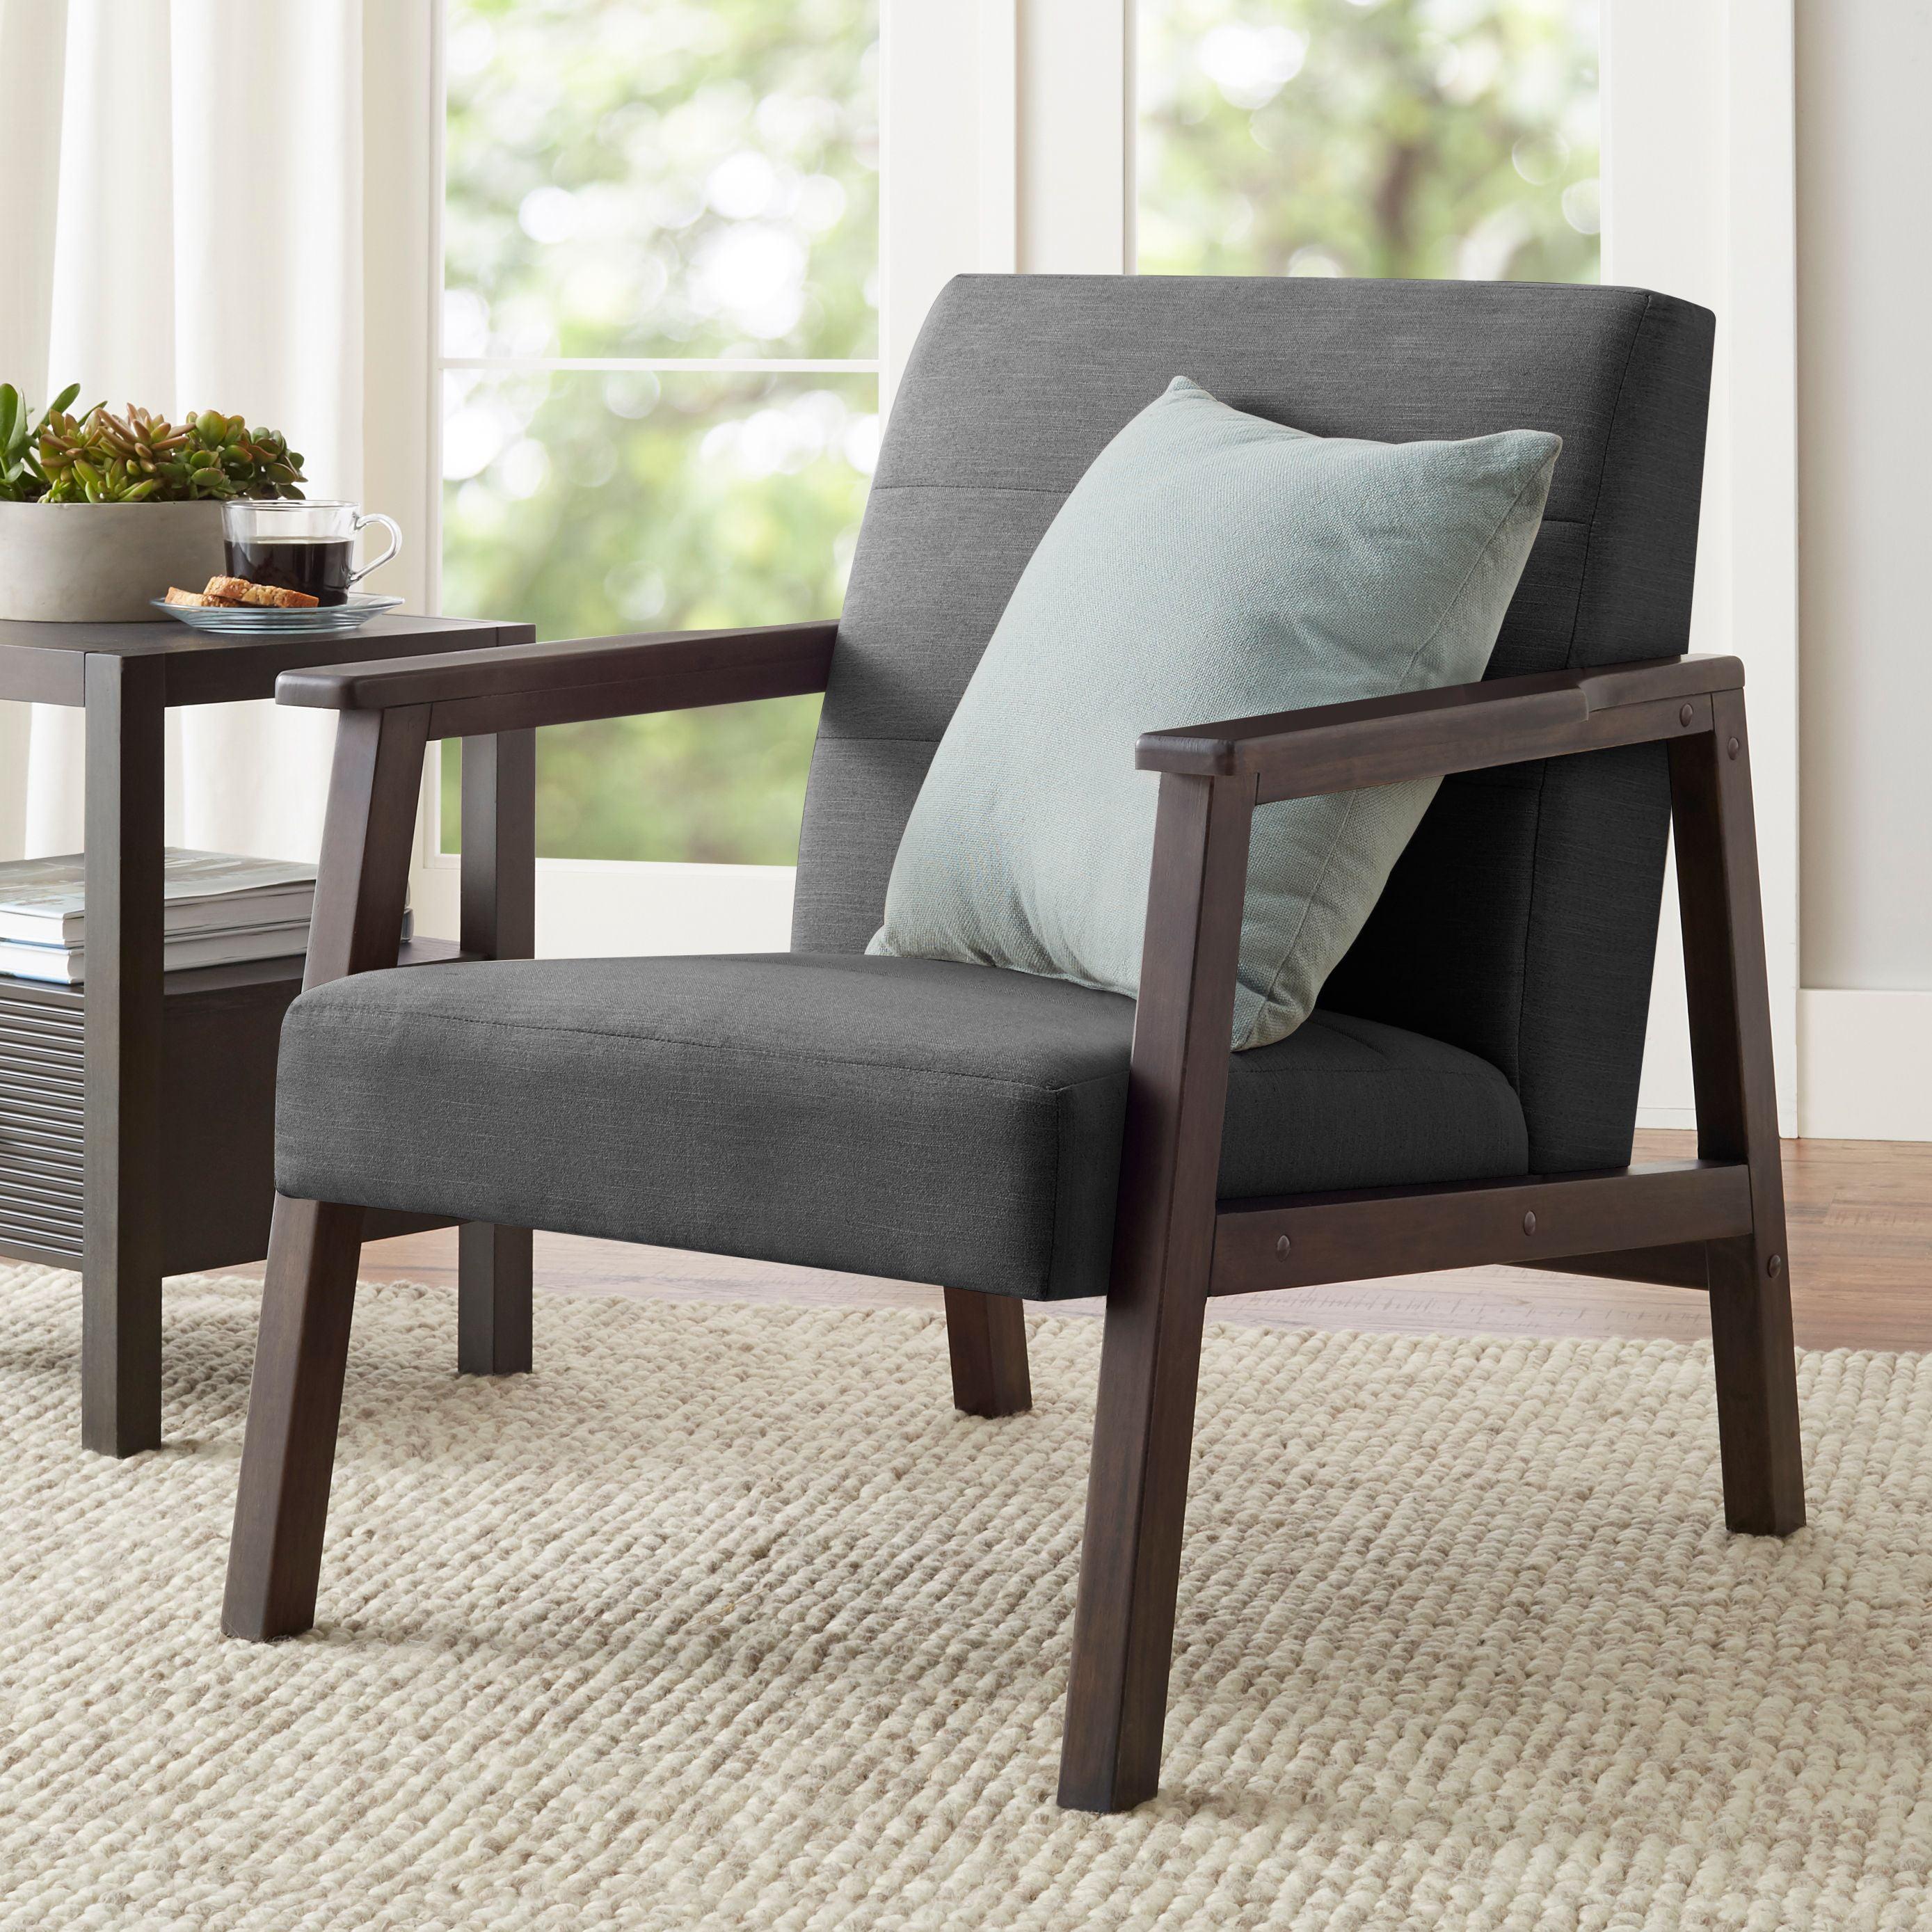 Better Homes & Gardens Elias Chair, Multiple Colors